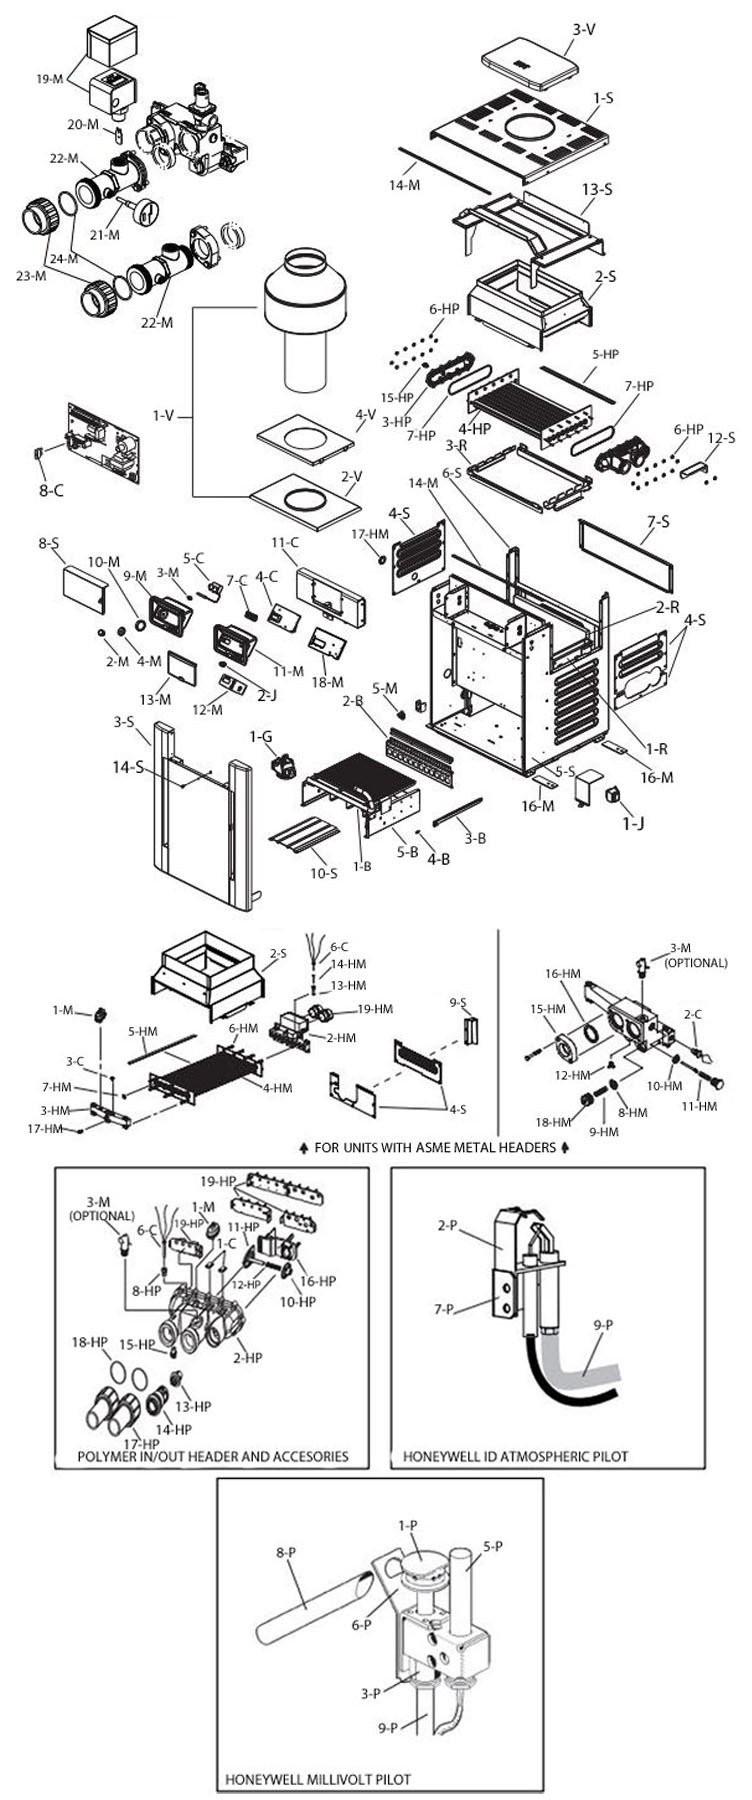 Raypak Digital Natural Gas Pool Heater 200K BTU | Electronic Ignition Digital | High Altitude #52 6000-9000 Feet | P-R206A-EN-C 009846 P-M206A-EN-C 009970 Parts Schematic